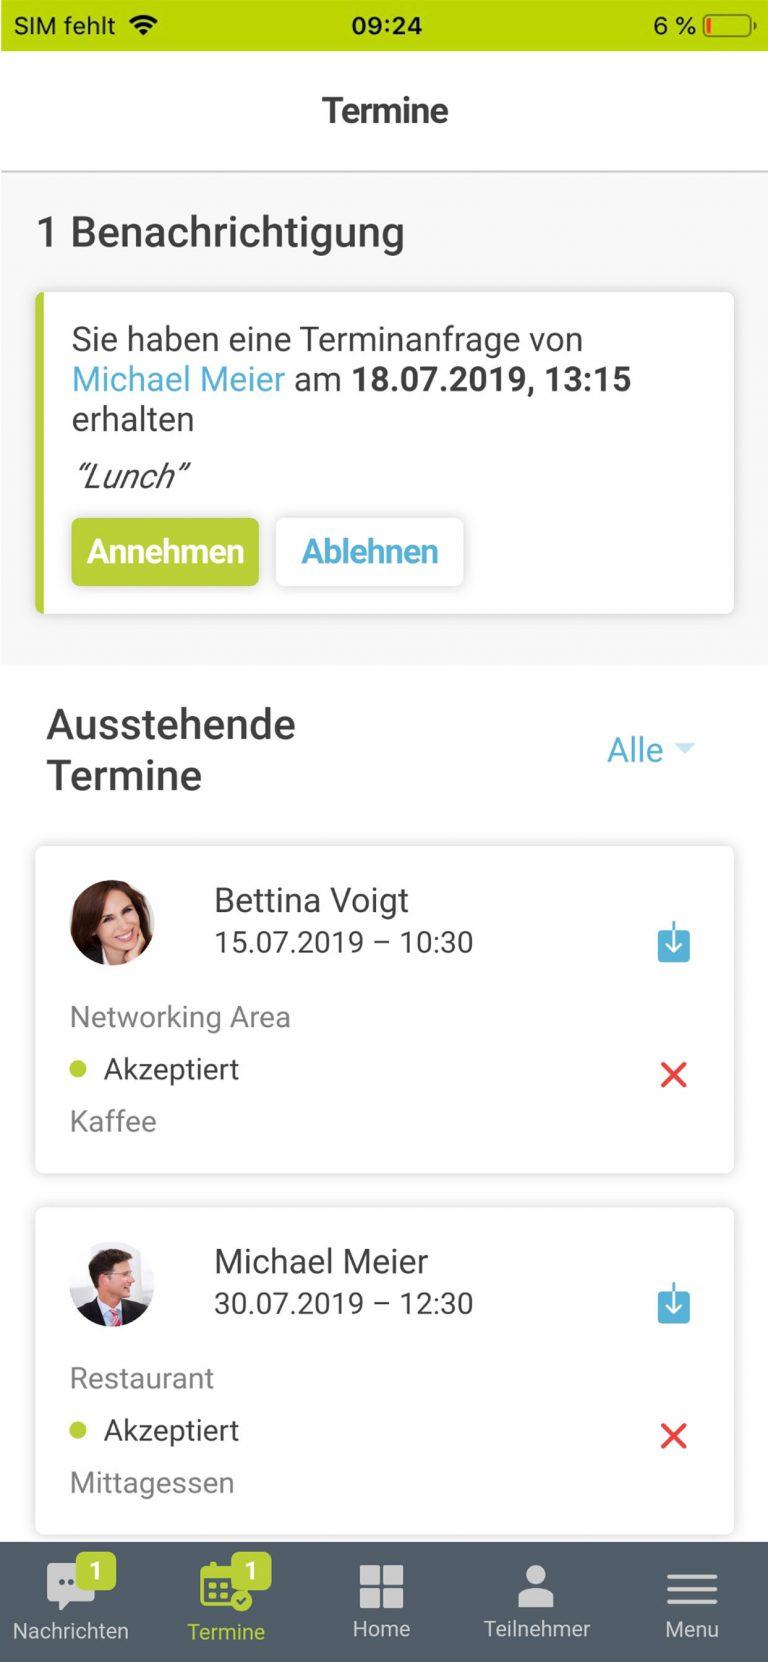 Termine - Event Software